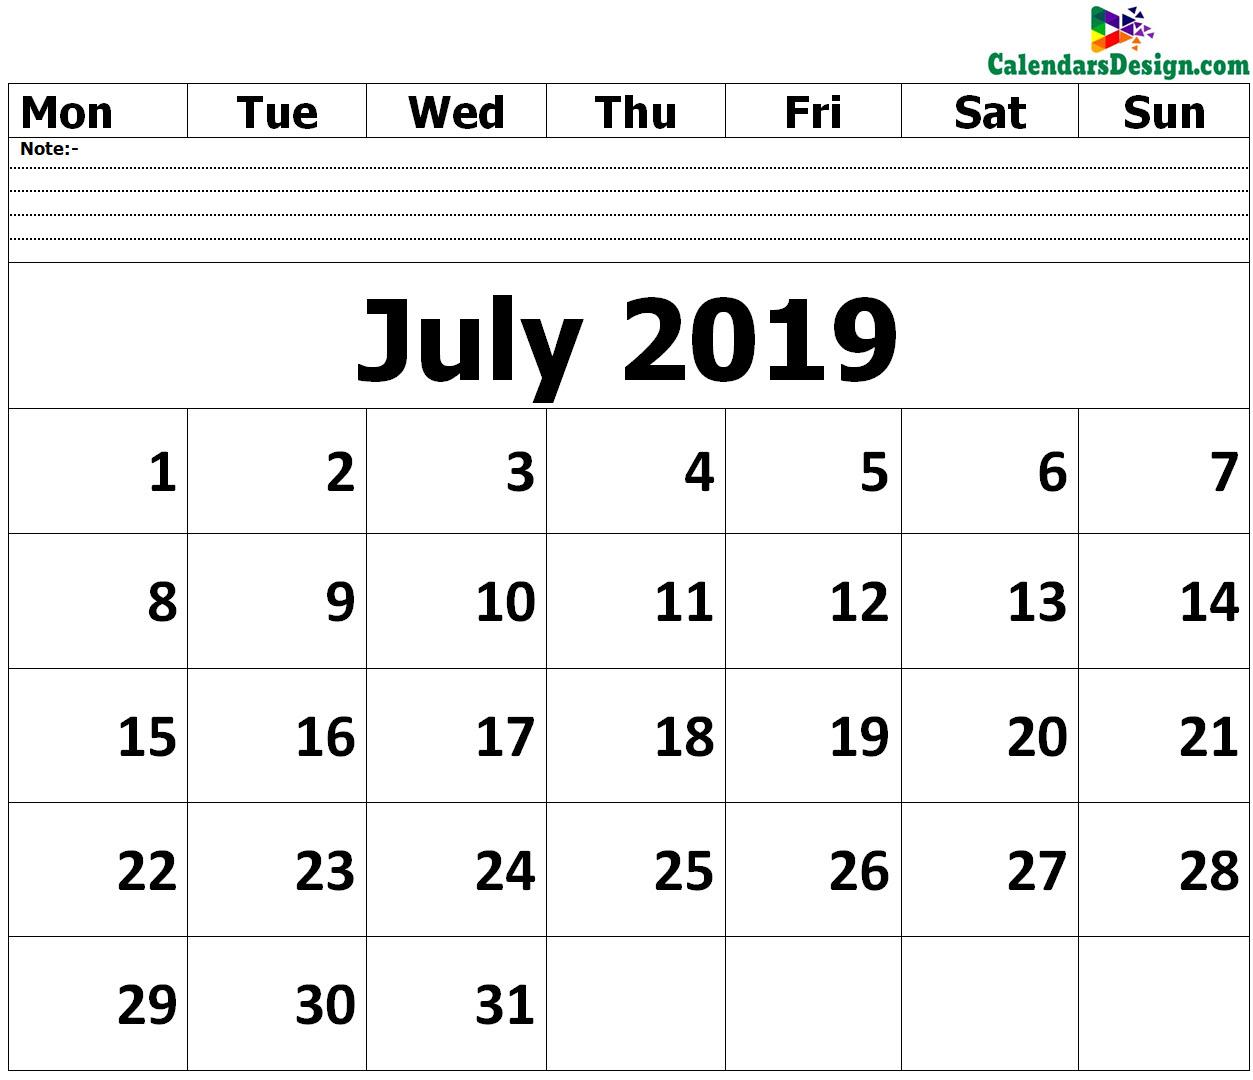 Editable July 2019 Calendar Blank Template - Free 2019 Printable throughout Free Fillable Blank Calendar Templates